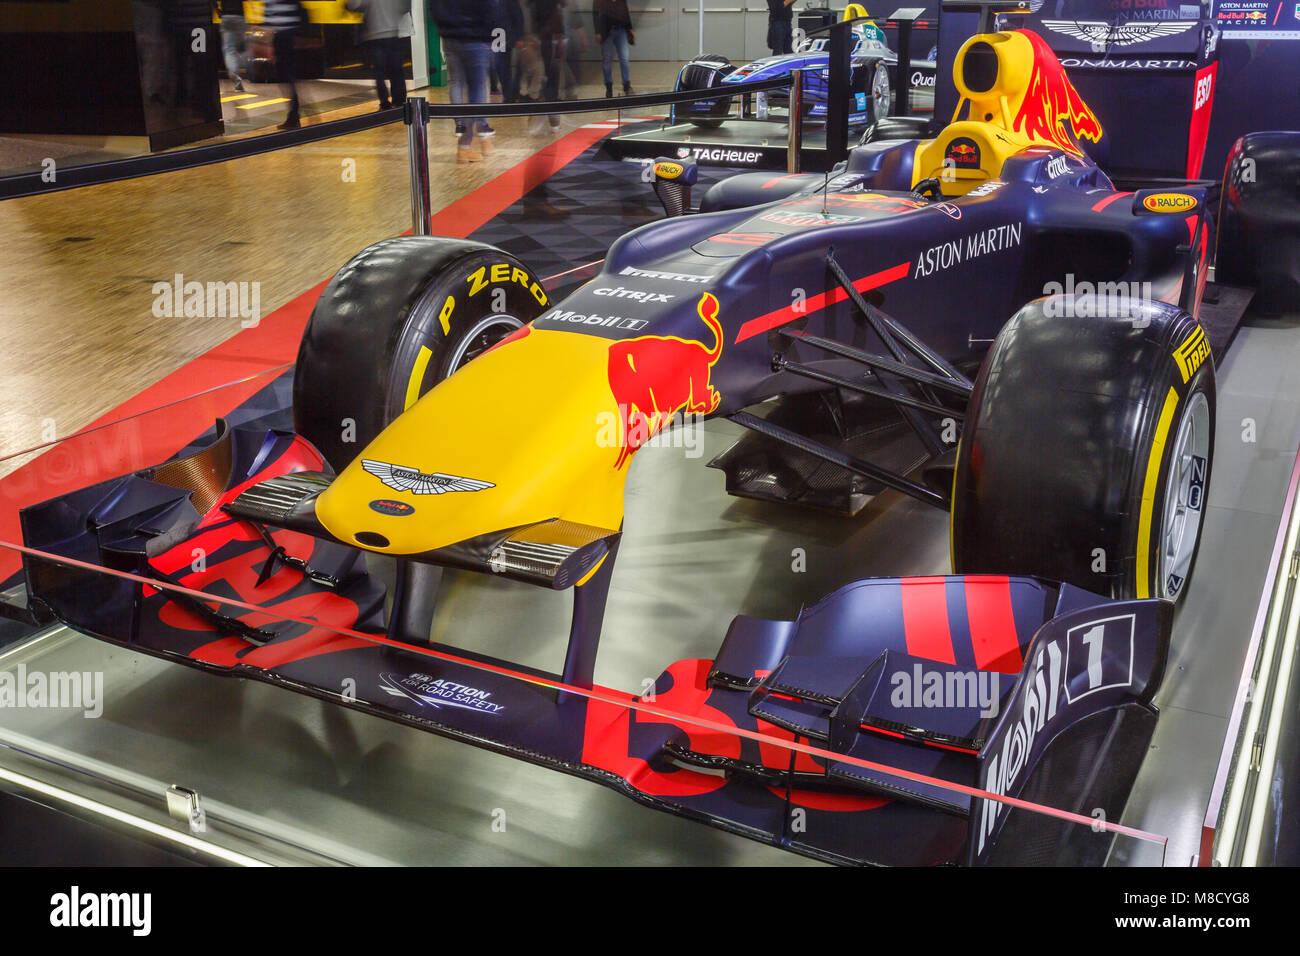 Formula 1 Single Seater Stockfotos & Formula 1 Single Seater Bilder ...